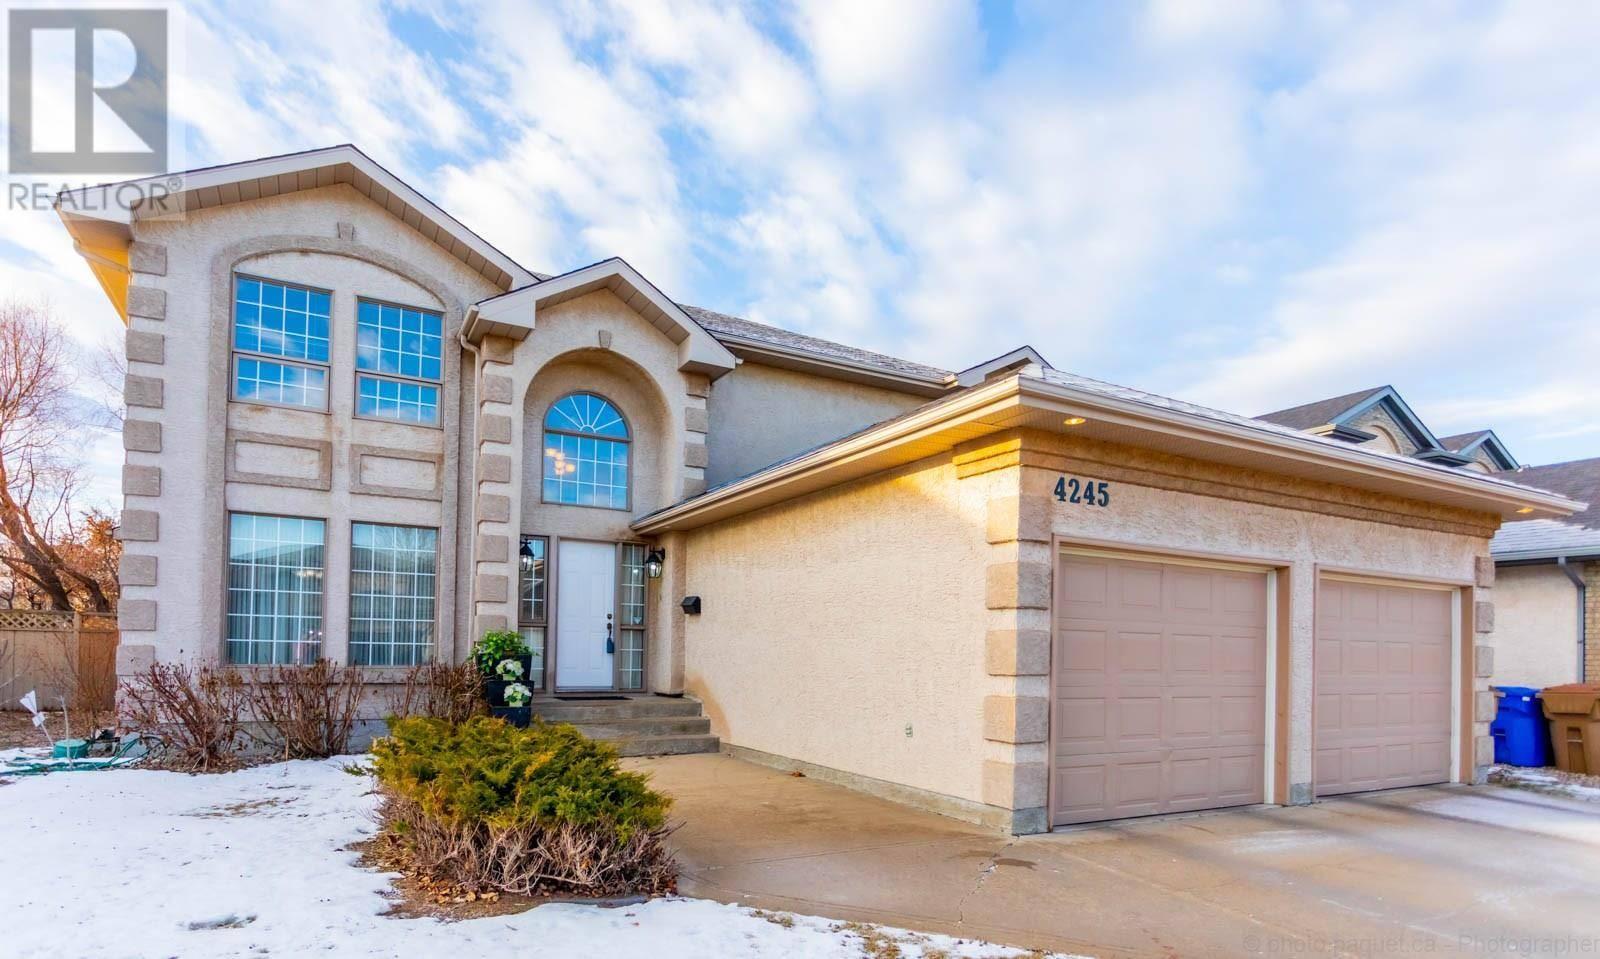 House for sale at 4245 Wascana Rdg  Regina Saskatchewan - MLS: SK793121